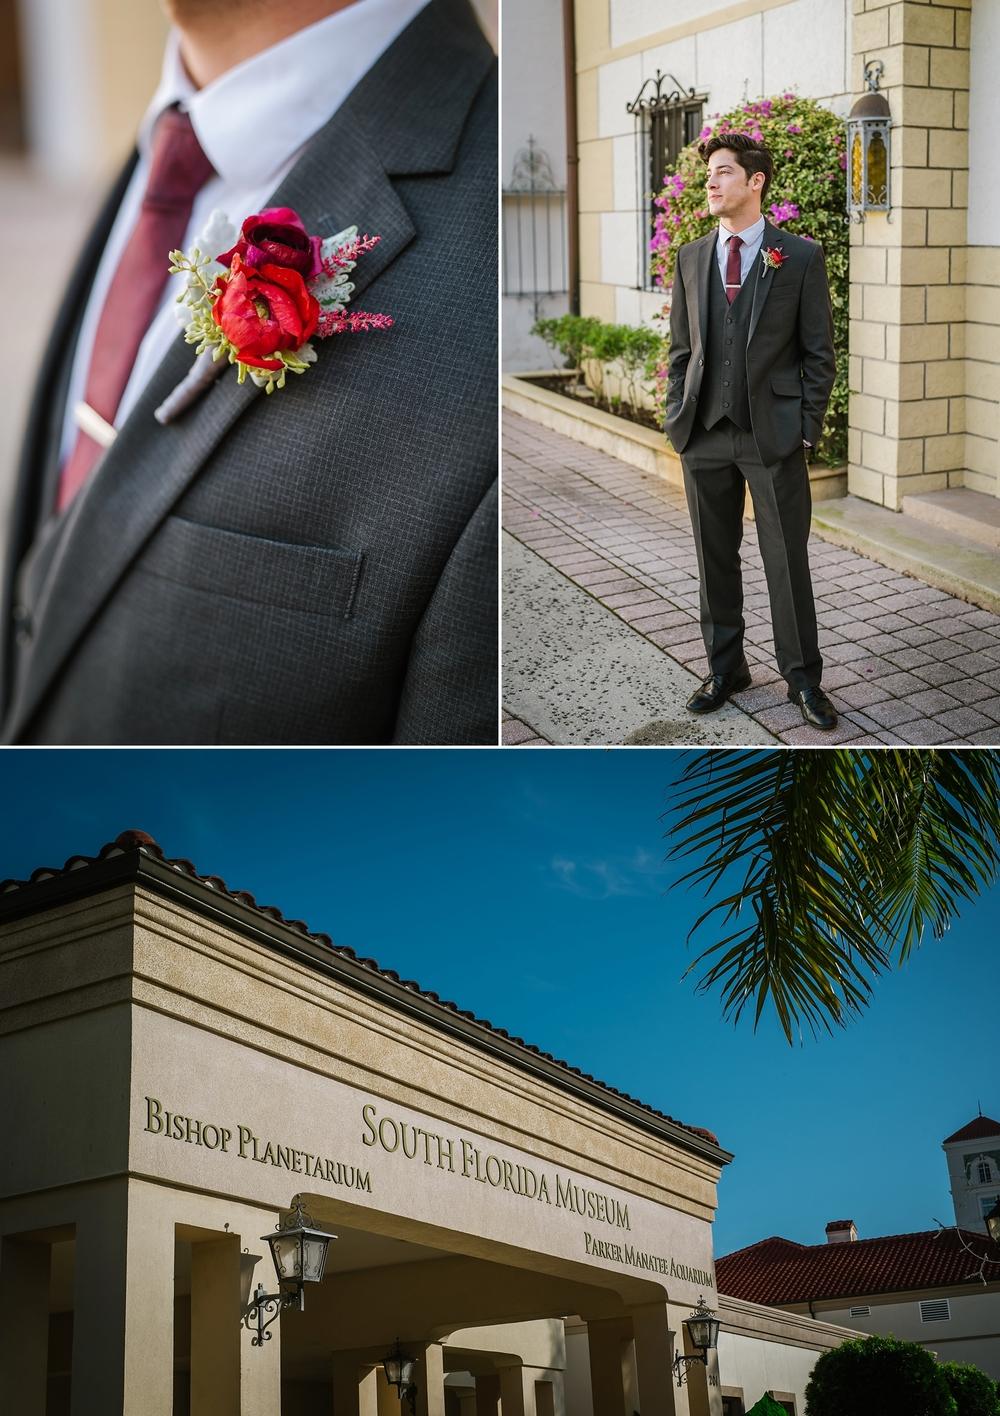 south-florida-museum-wedding-photography-bradenton_0004.jpg